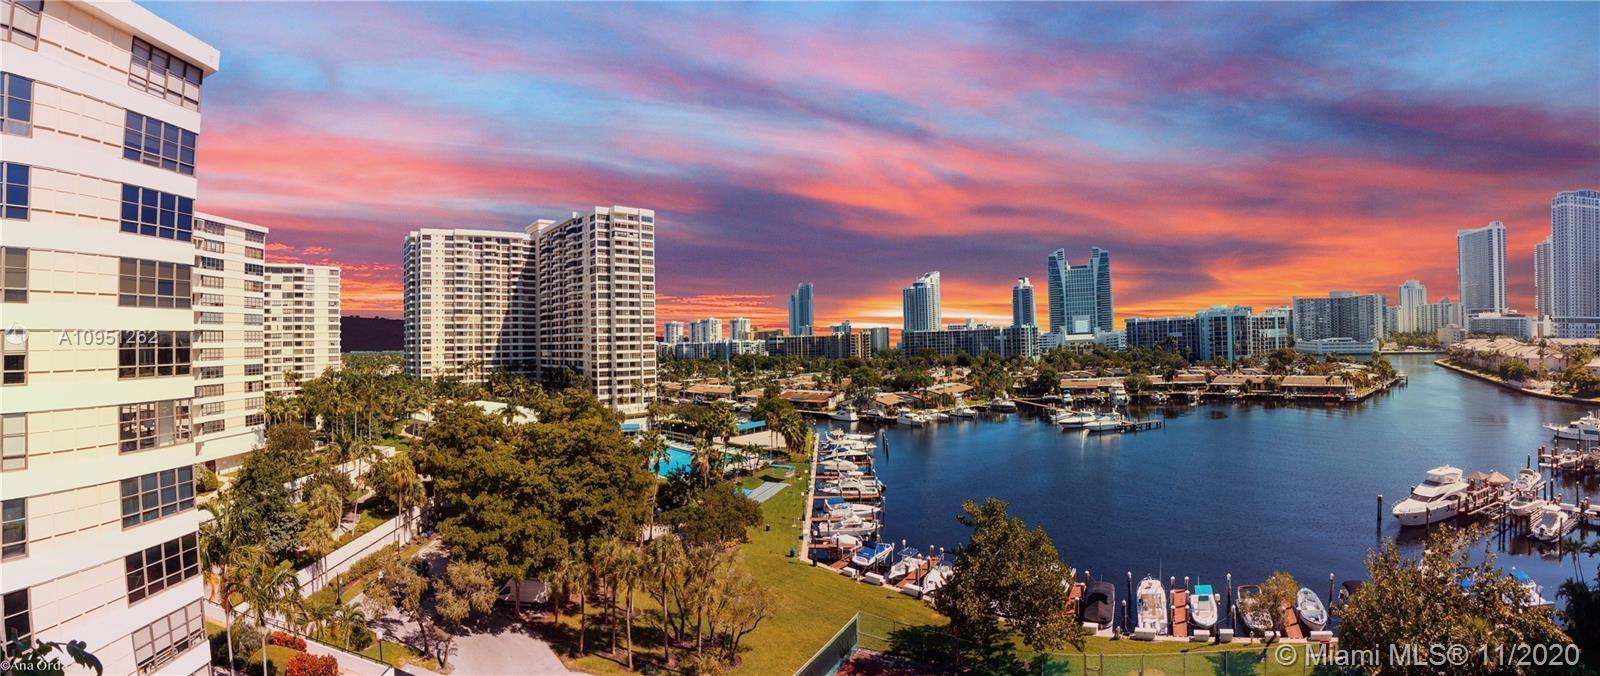 500 Three Islands Blvd #524, Hallandale Beach, FL 33009 - #: A10951262